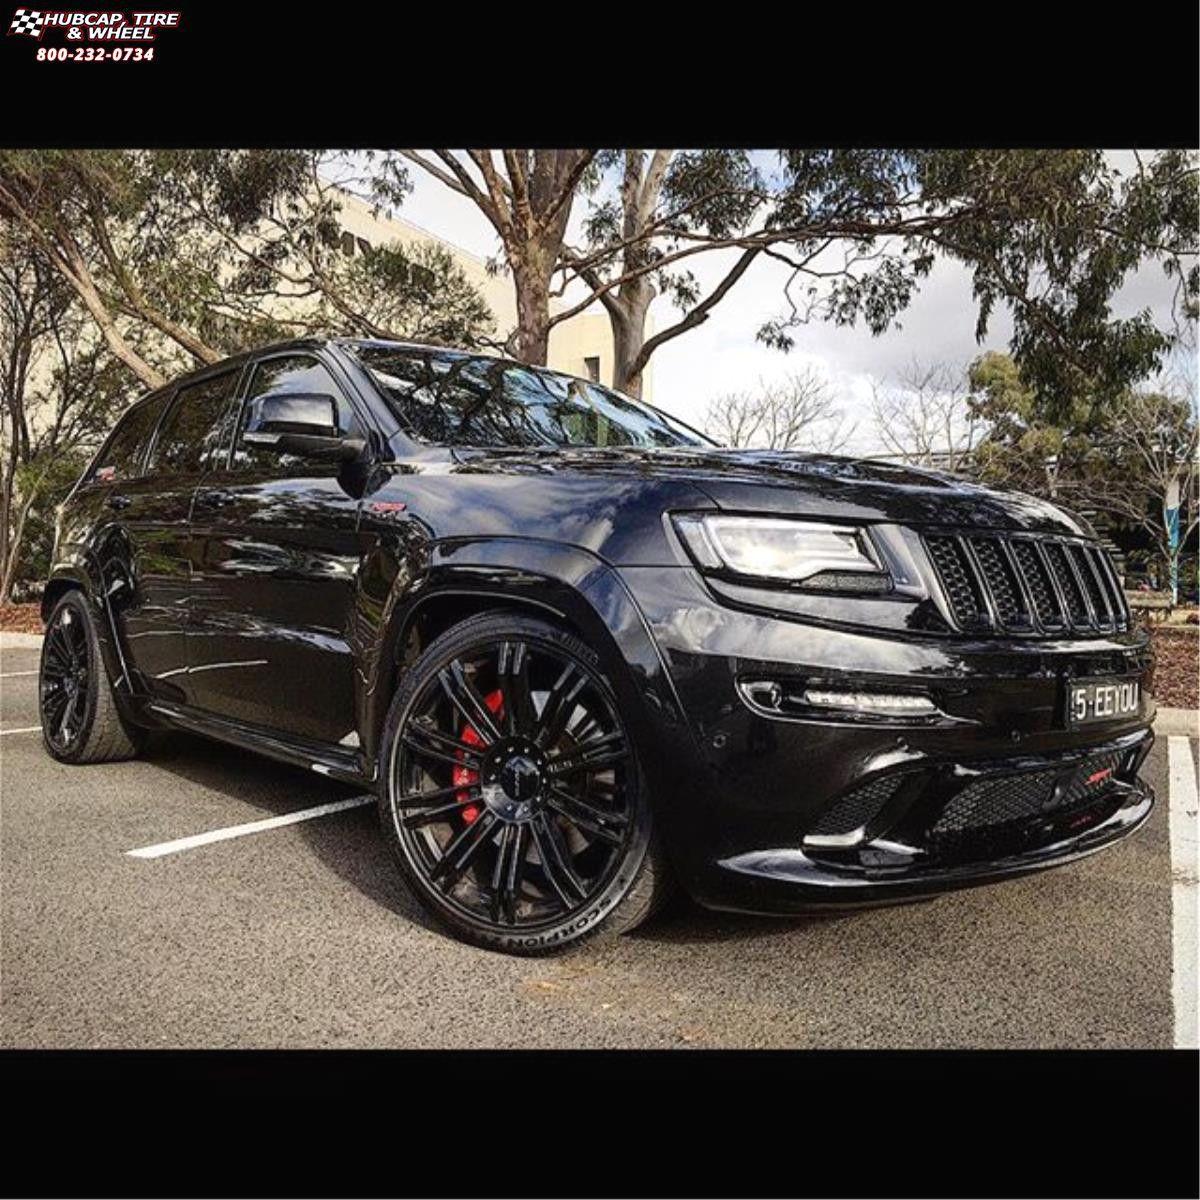 Jeep Grand Cherokee Kmc Km677 D2 Wheels Gloss Black With 22 Inch Rims Jeep Grand Cherokee And On 1200x1200px 22 Inc Jeep Grand Cherokee Jeep Grand 22 Inch Rims